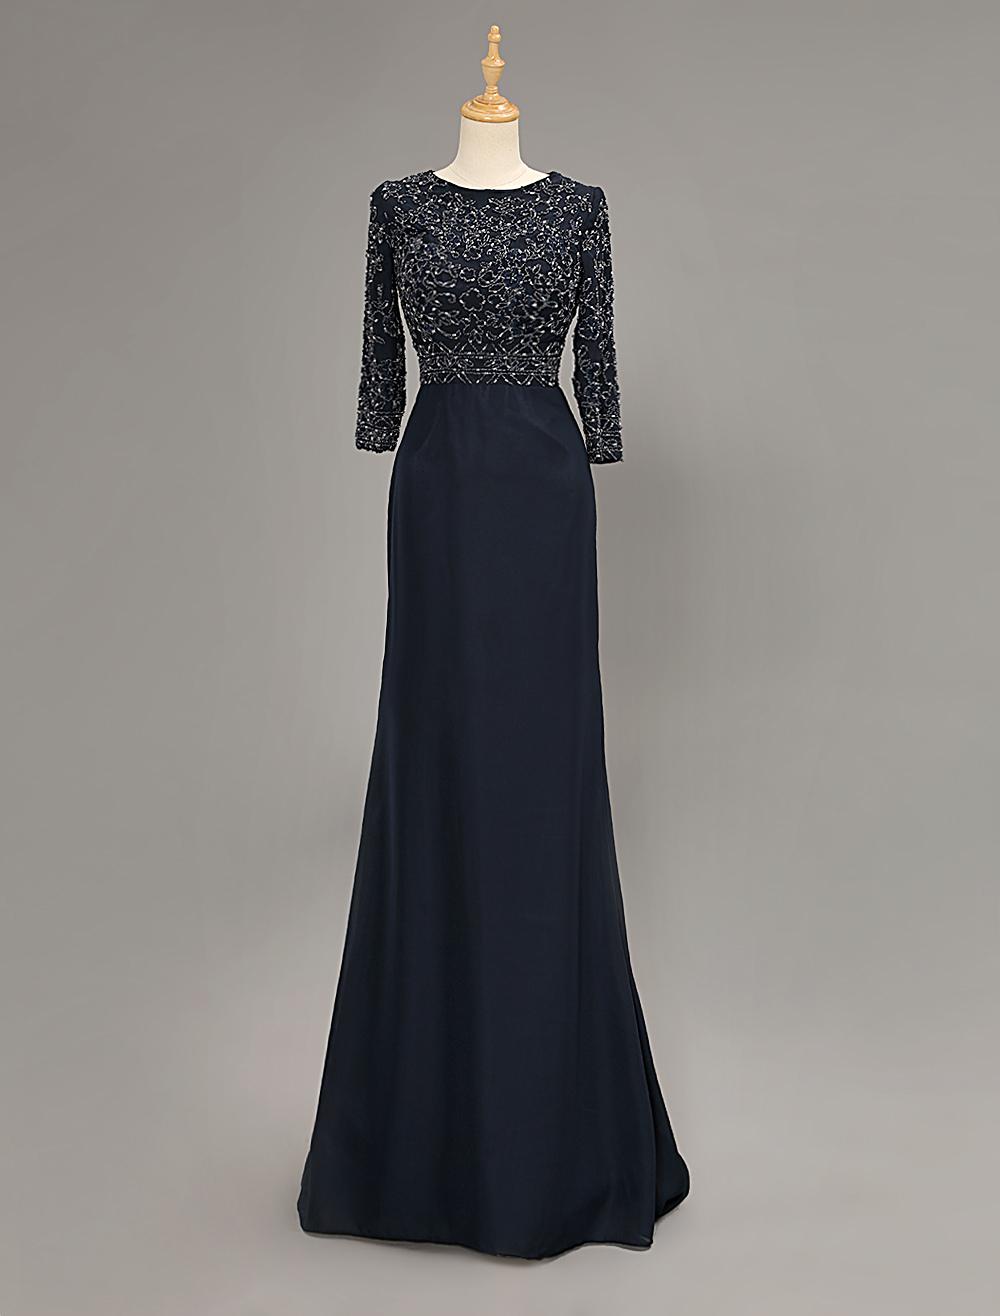 Dark Navy Half Sleeve Mother Of Bride Dress With Beading Decor